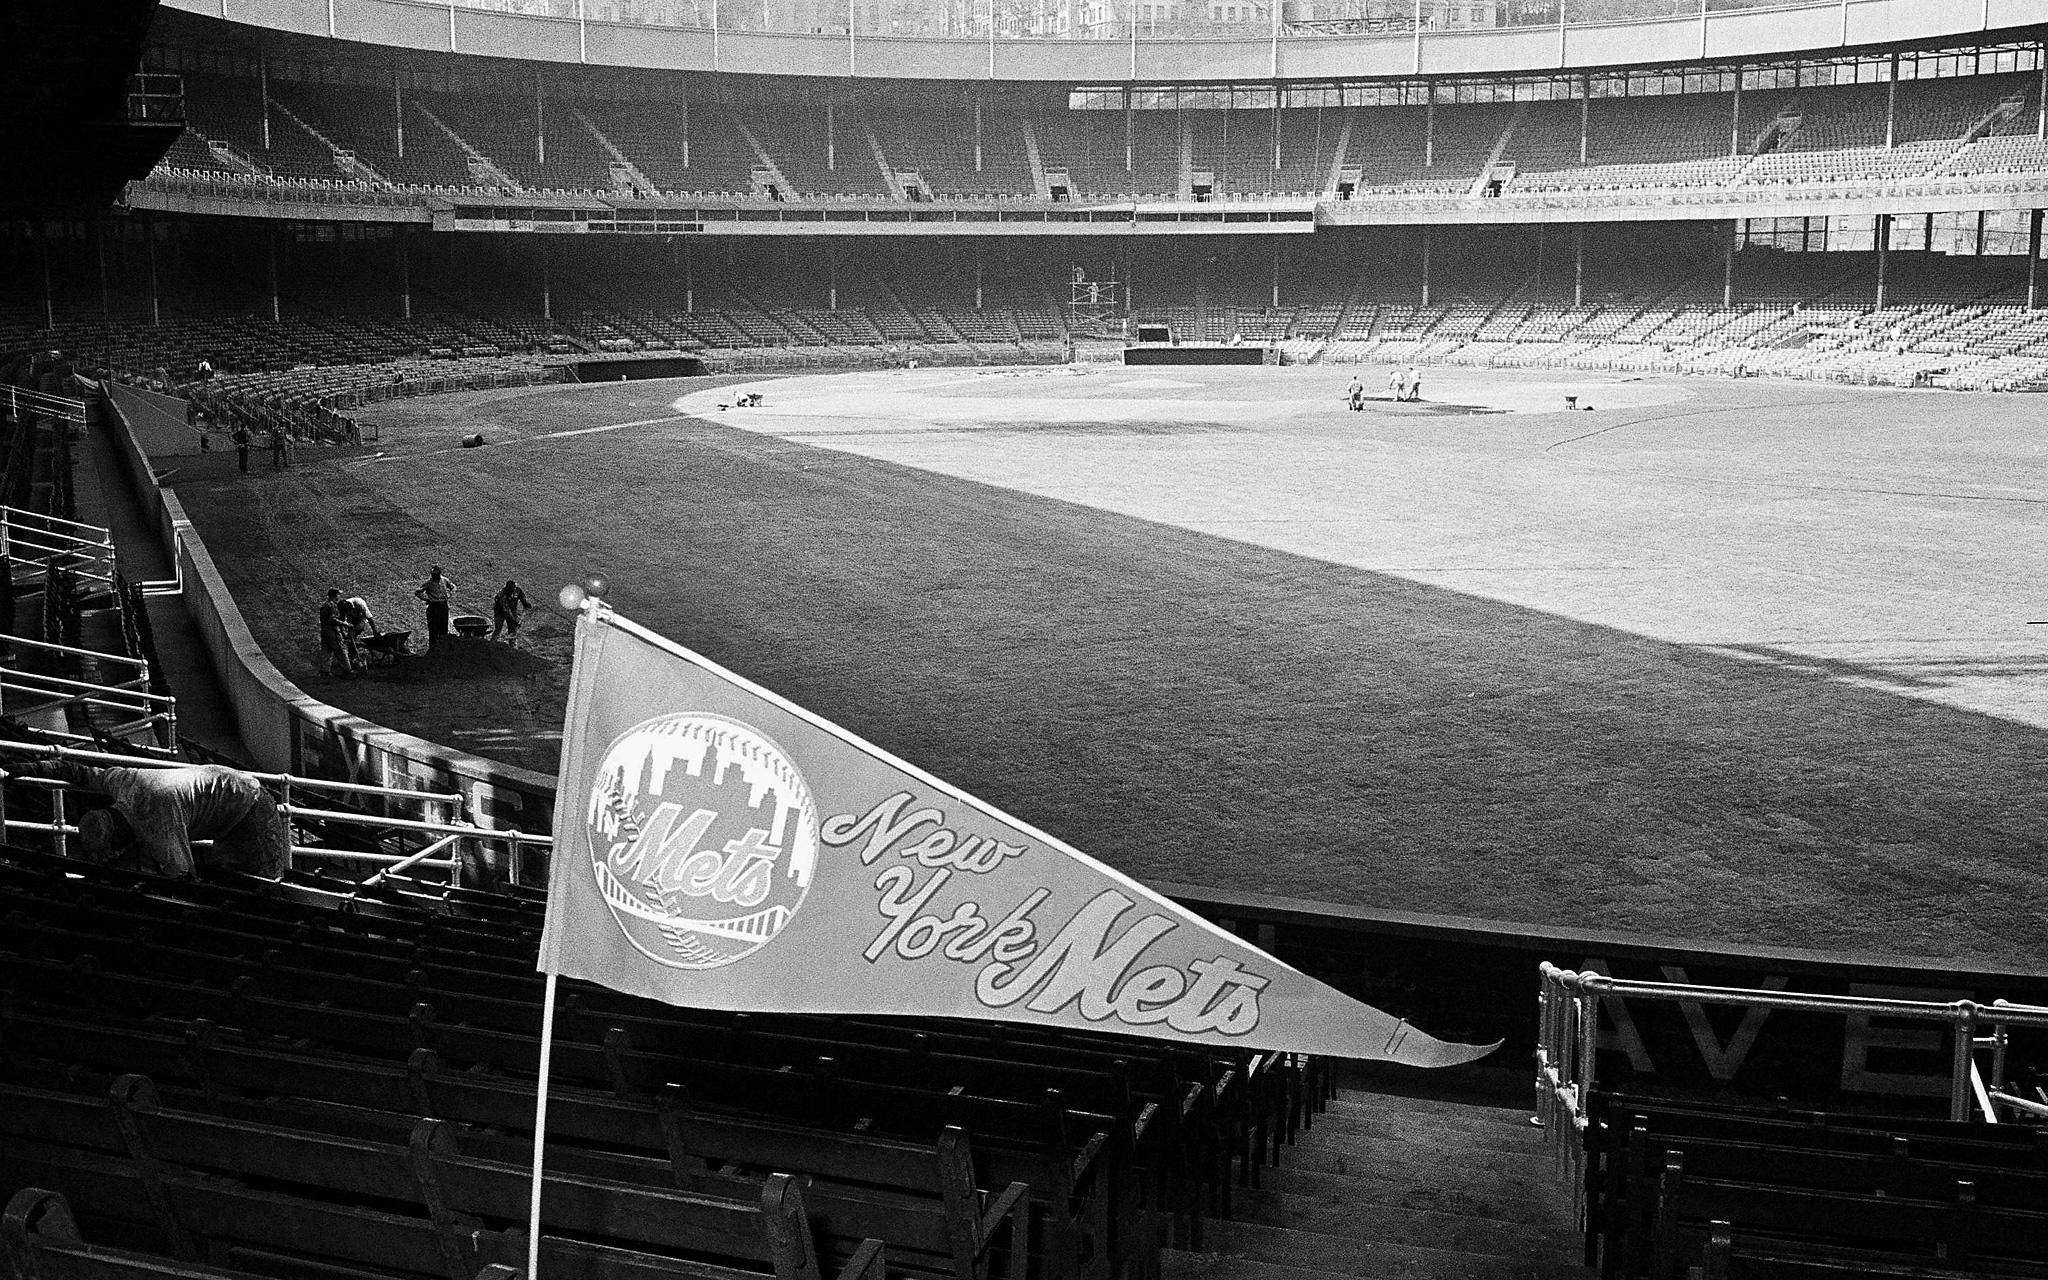 April 13th, 1962